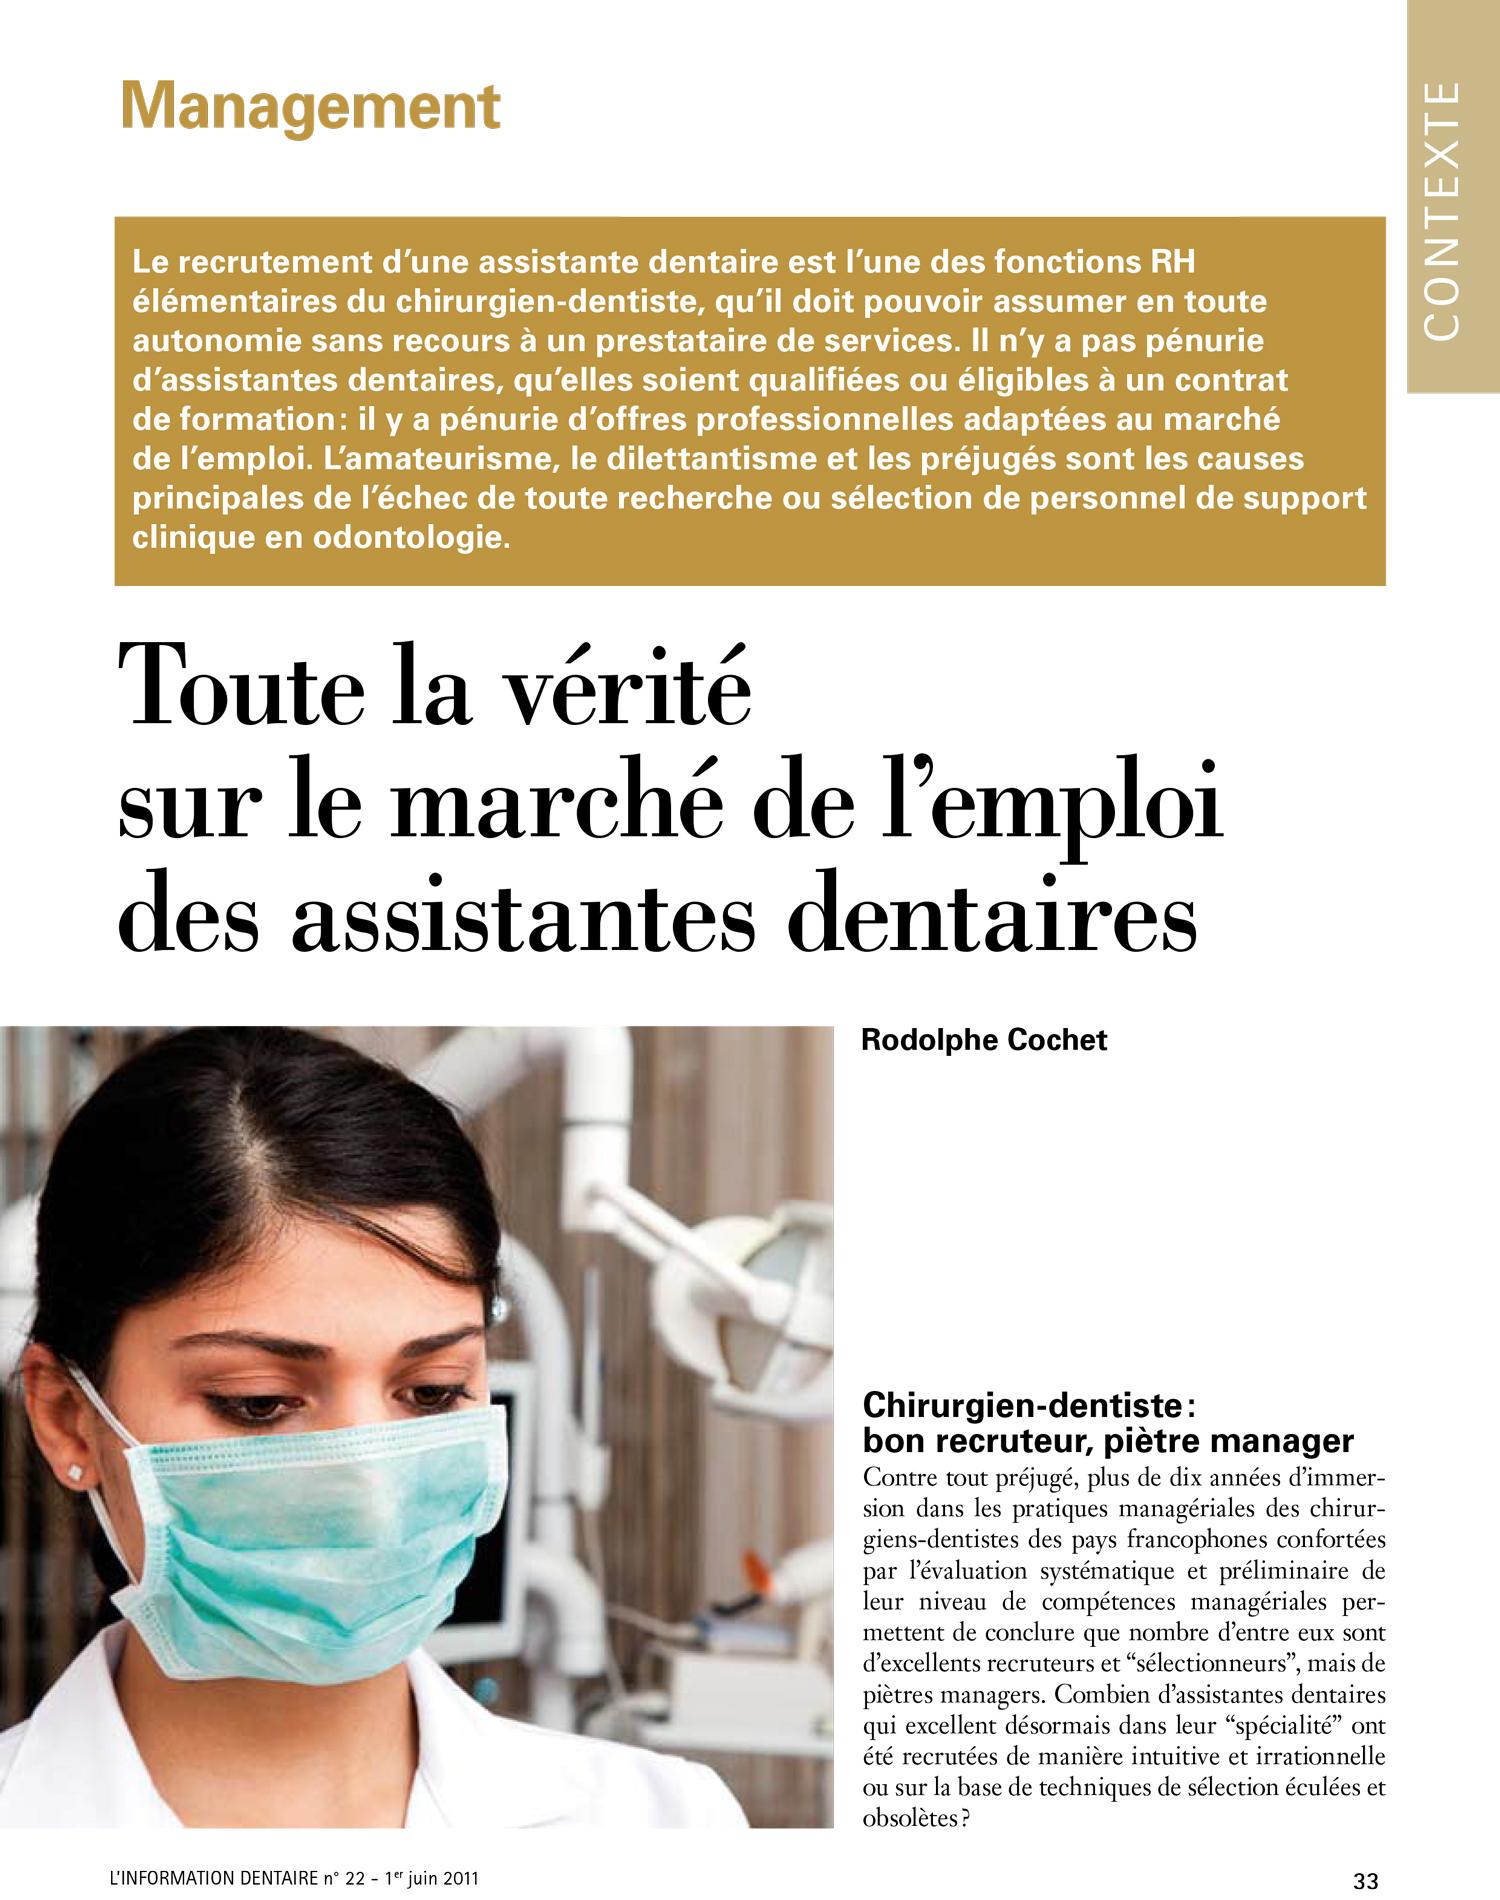 Verite-recrutement-marche-offres-emploi-assistantes-dentaires-cabinets-dentaires-1.jpg